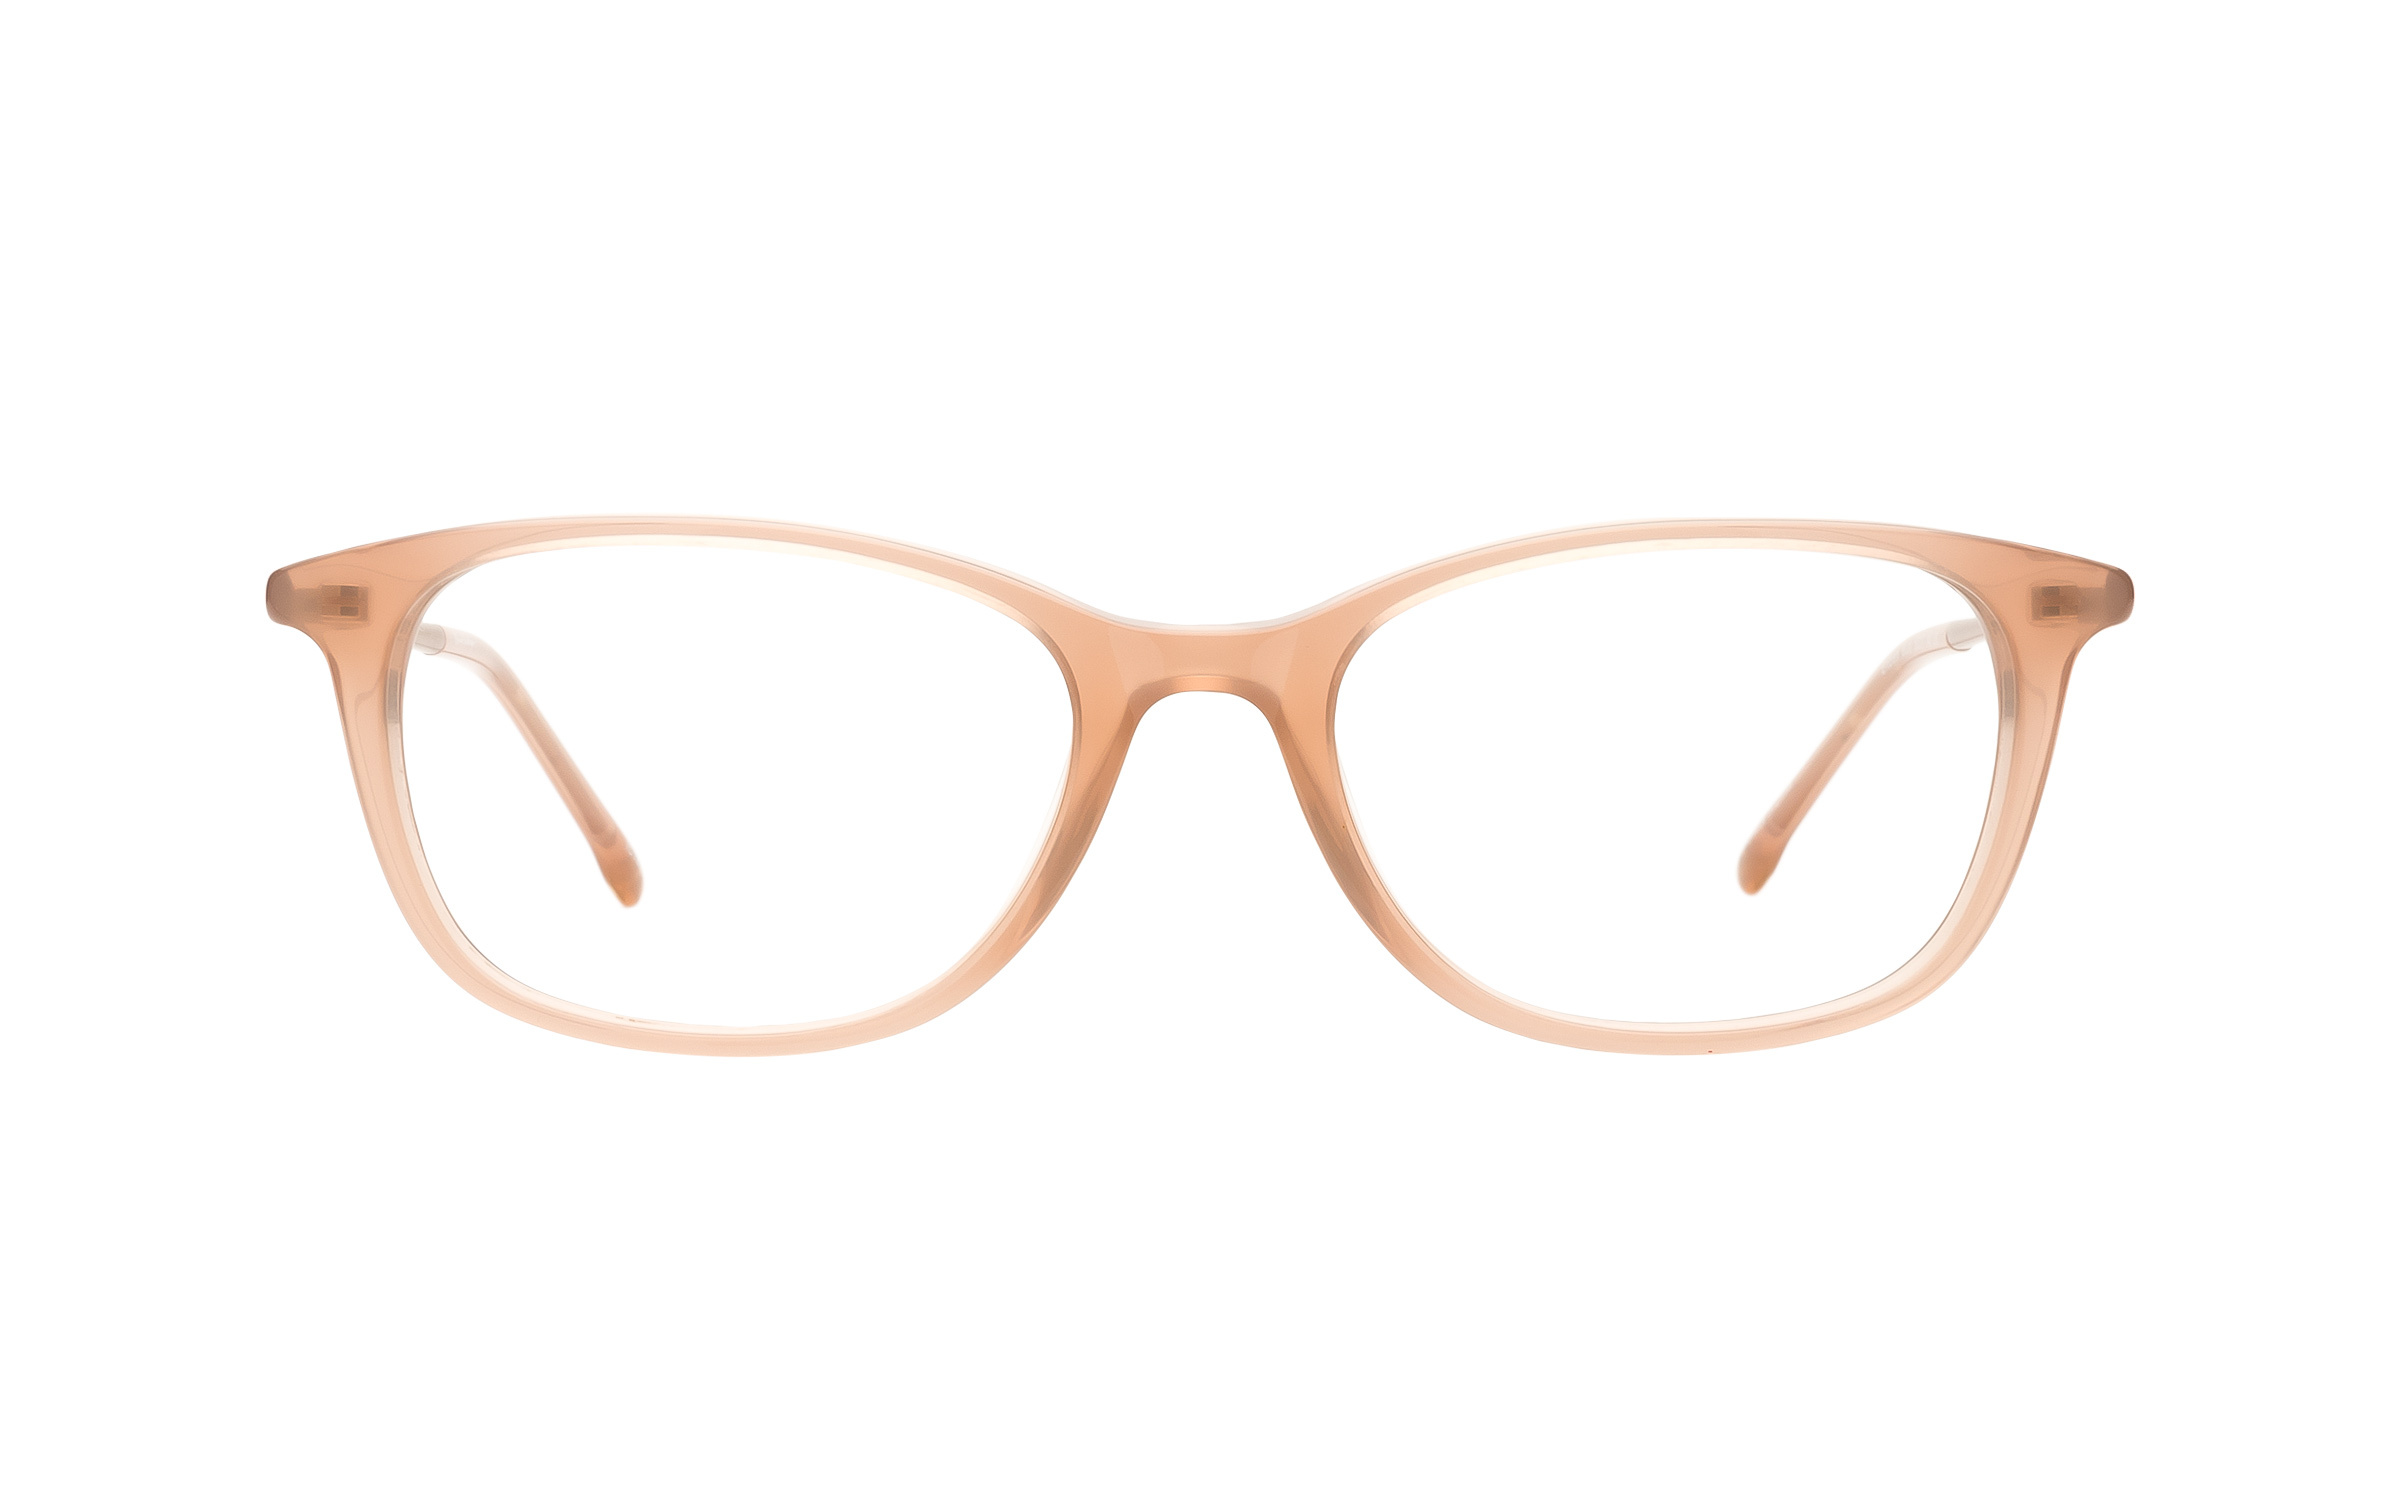 Derek_Cardigan_Womens_Glasses_Rectangular_ClearPink_Metal_Online_Coastal